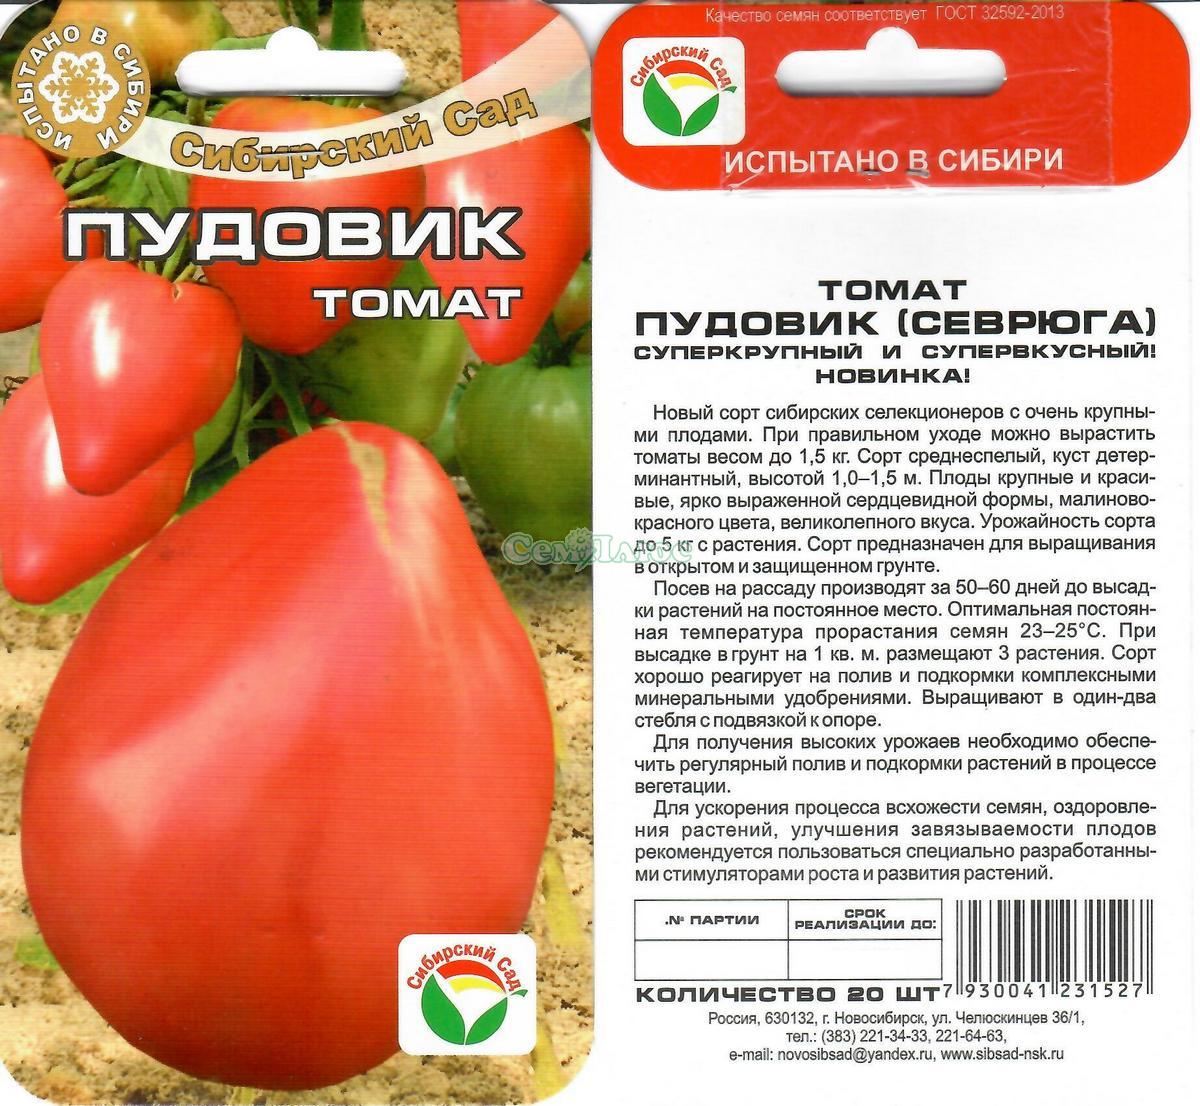 "ᐉ томаты ""пудовичок сахарный"": описание и характеристики сорта, уход за помидорами и фото - orensad198.ru"